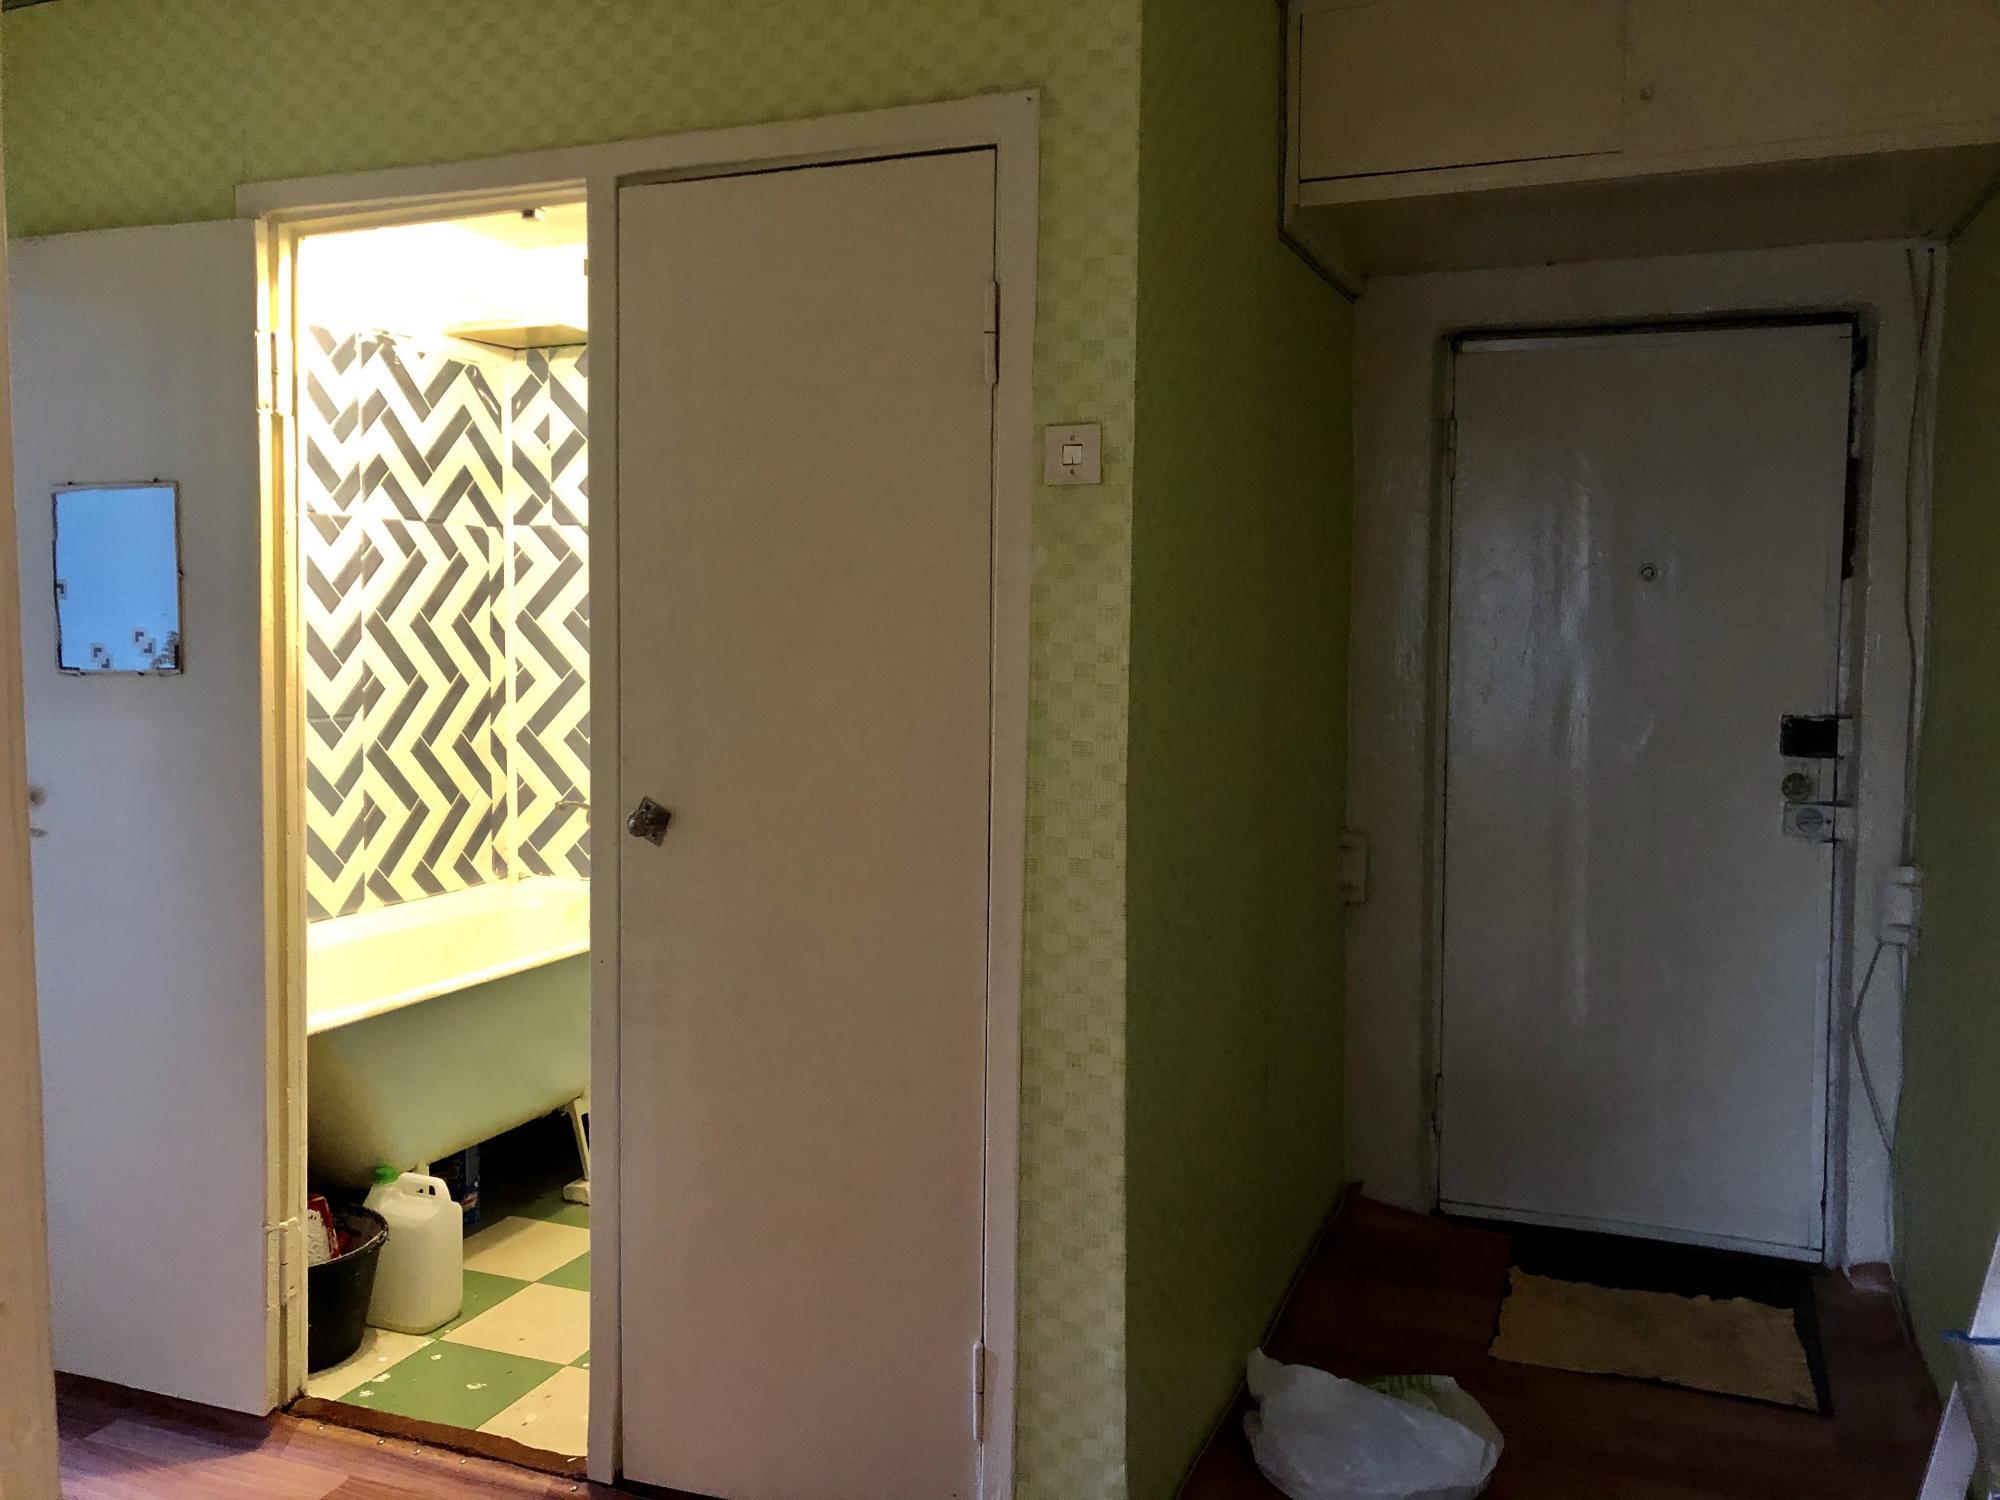 1к квартира Судостроительная улица, 30 | 10000 | аренда в Красноярске фото 6